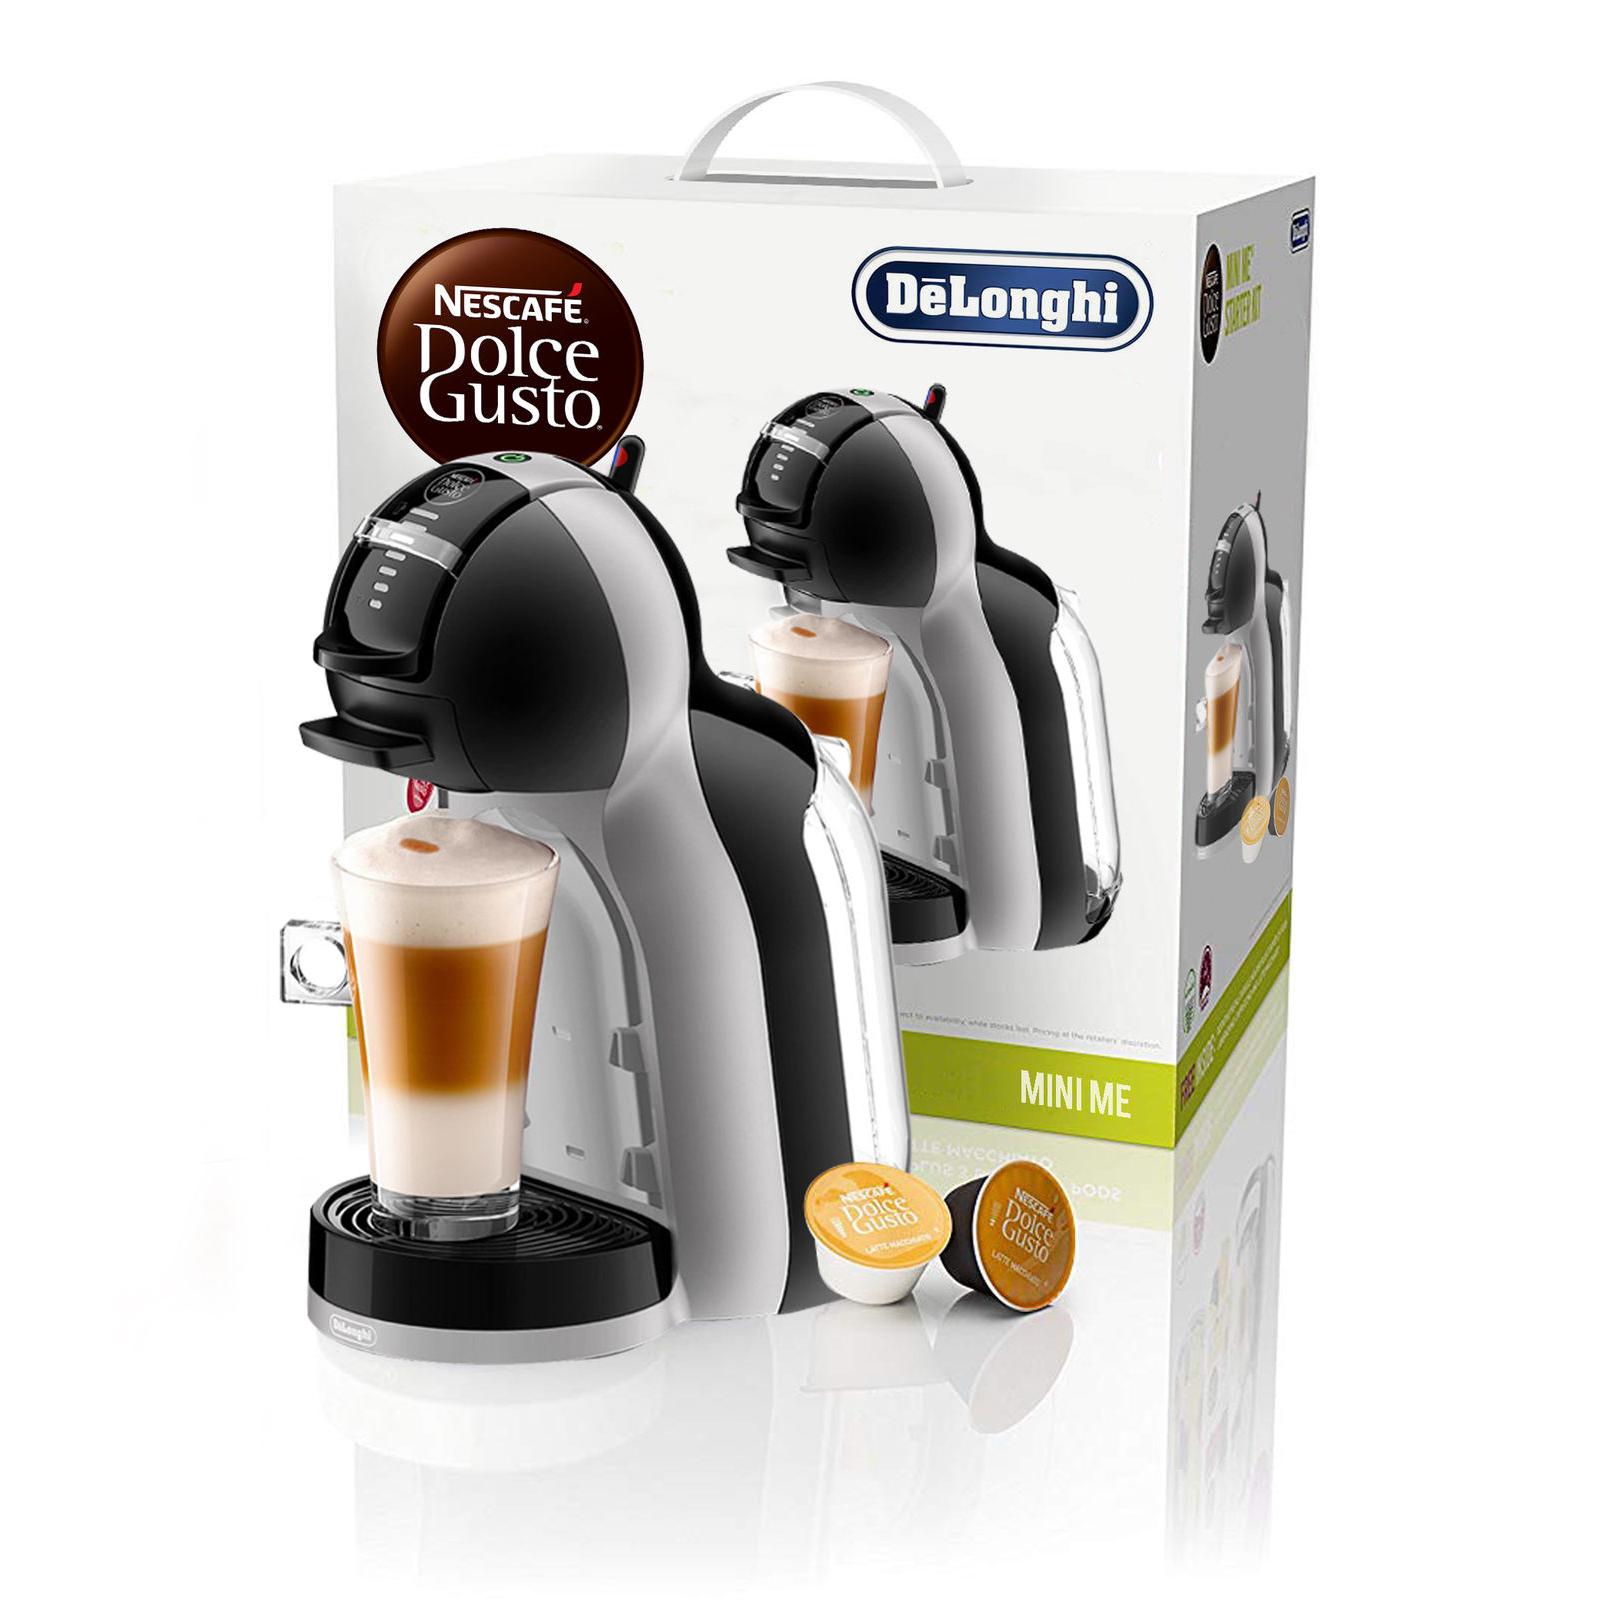 nescaf dolce gusto by de 39 longhi mini me edg155 bg capsule pod coffee machine ebay